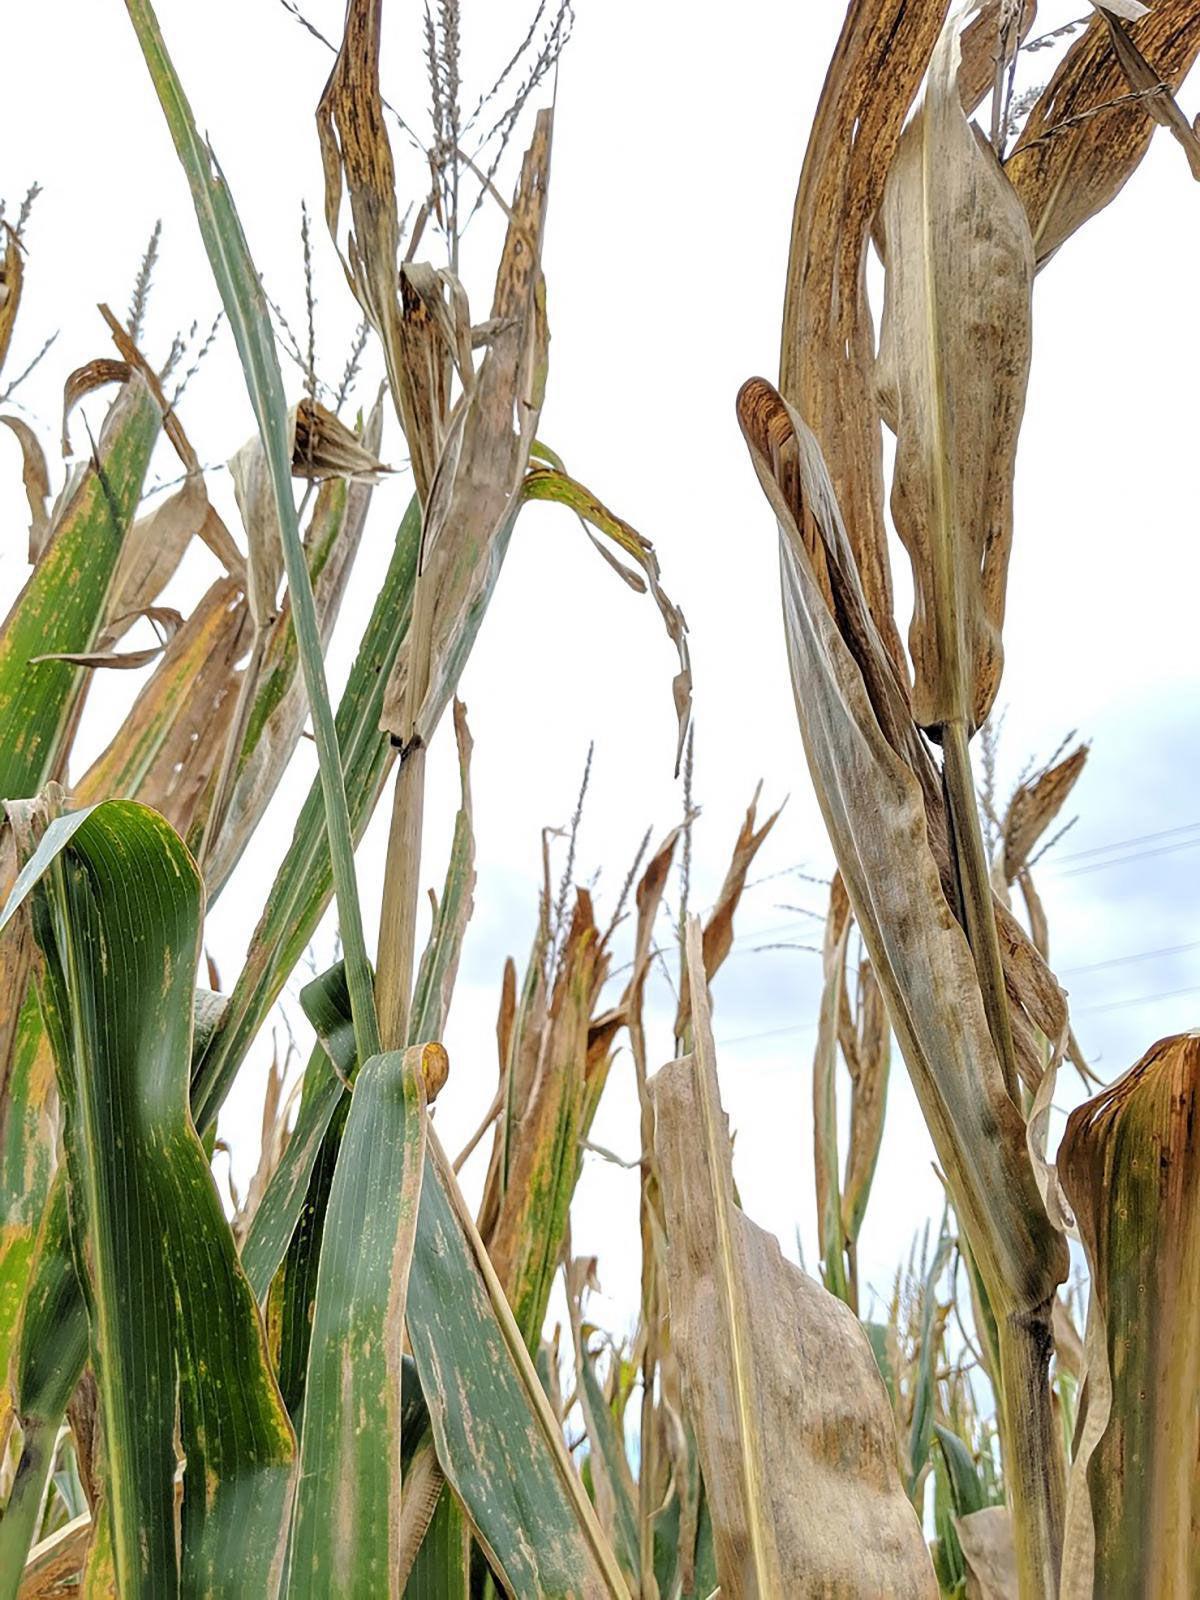 Corn plants exhibit symptoms of top dieback